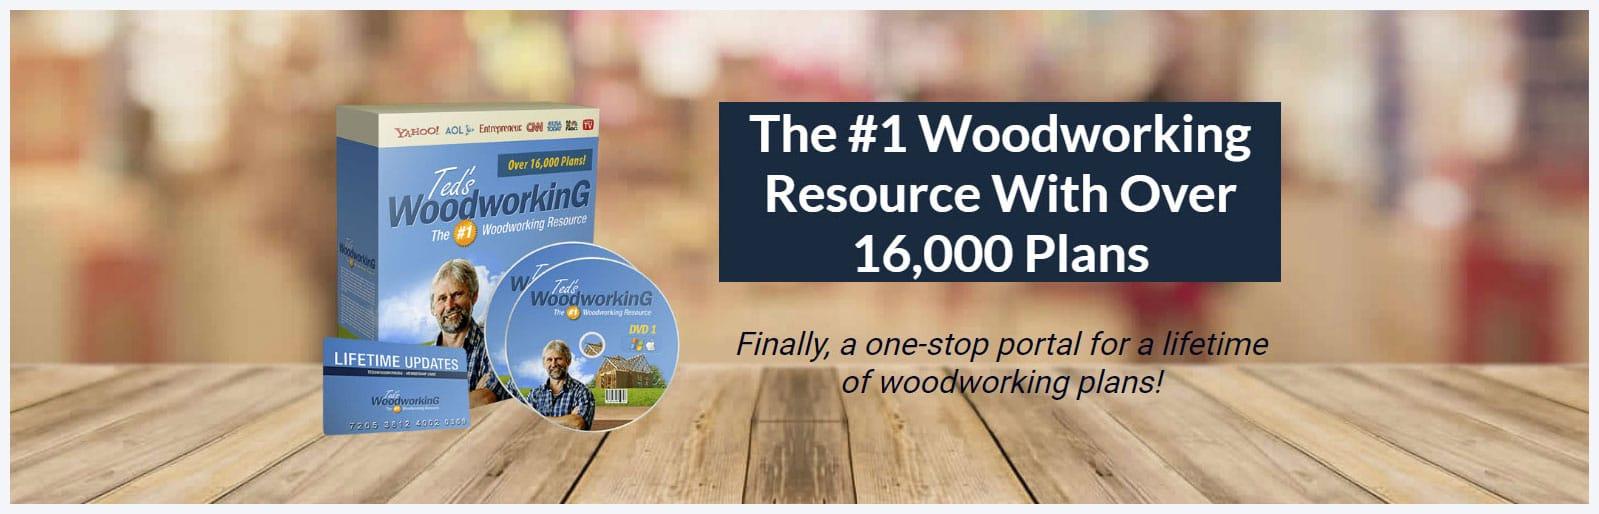 teds woodworking header